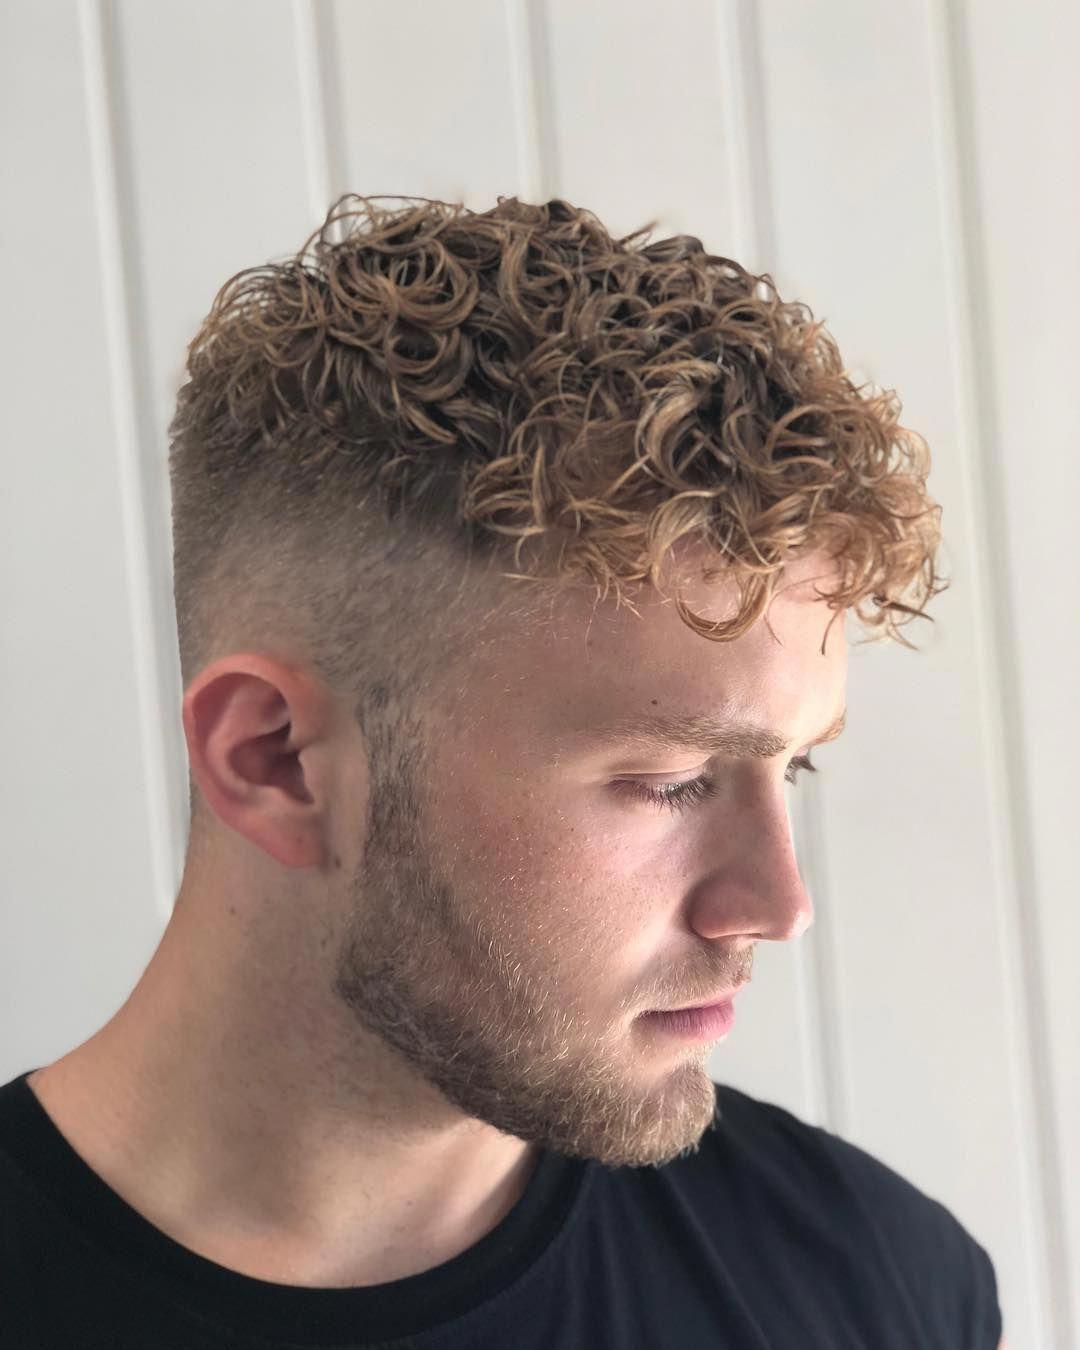 Refreshing Oscar Mcmillan Perm Perm Curls Manperm Merm Hairstyletrendsformen Short Permed Hair Curly Hair Fade Permed Hairstyles